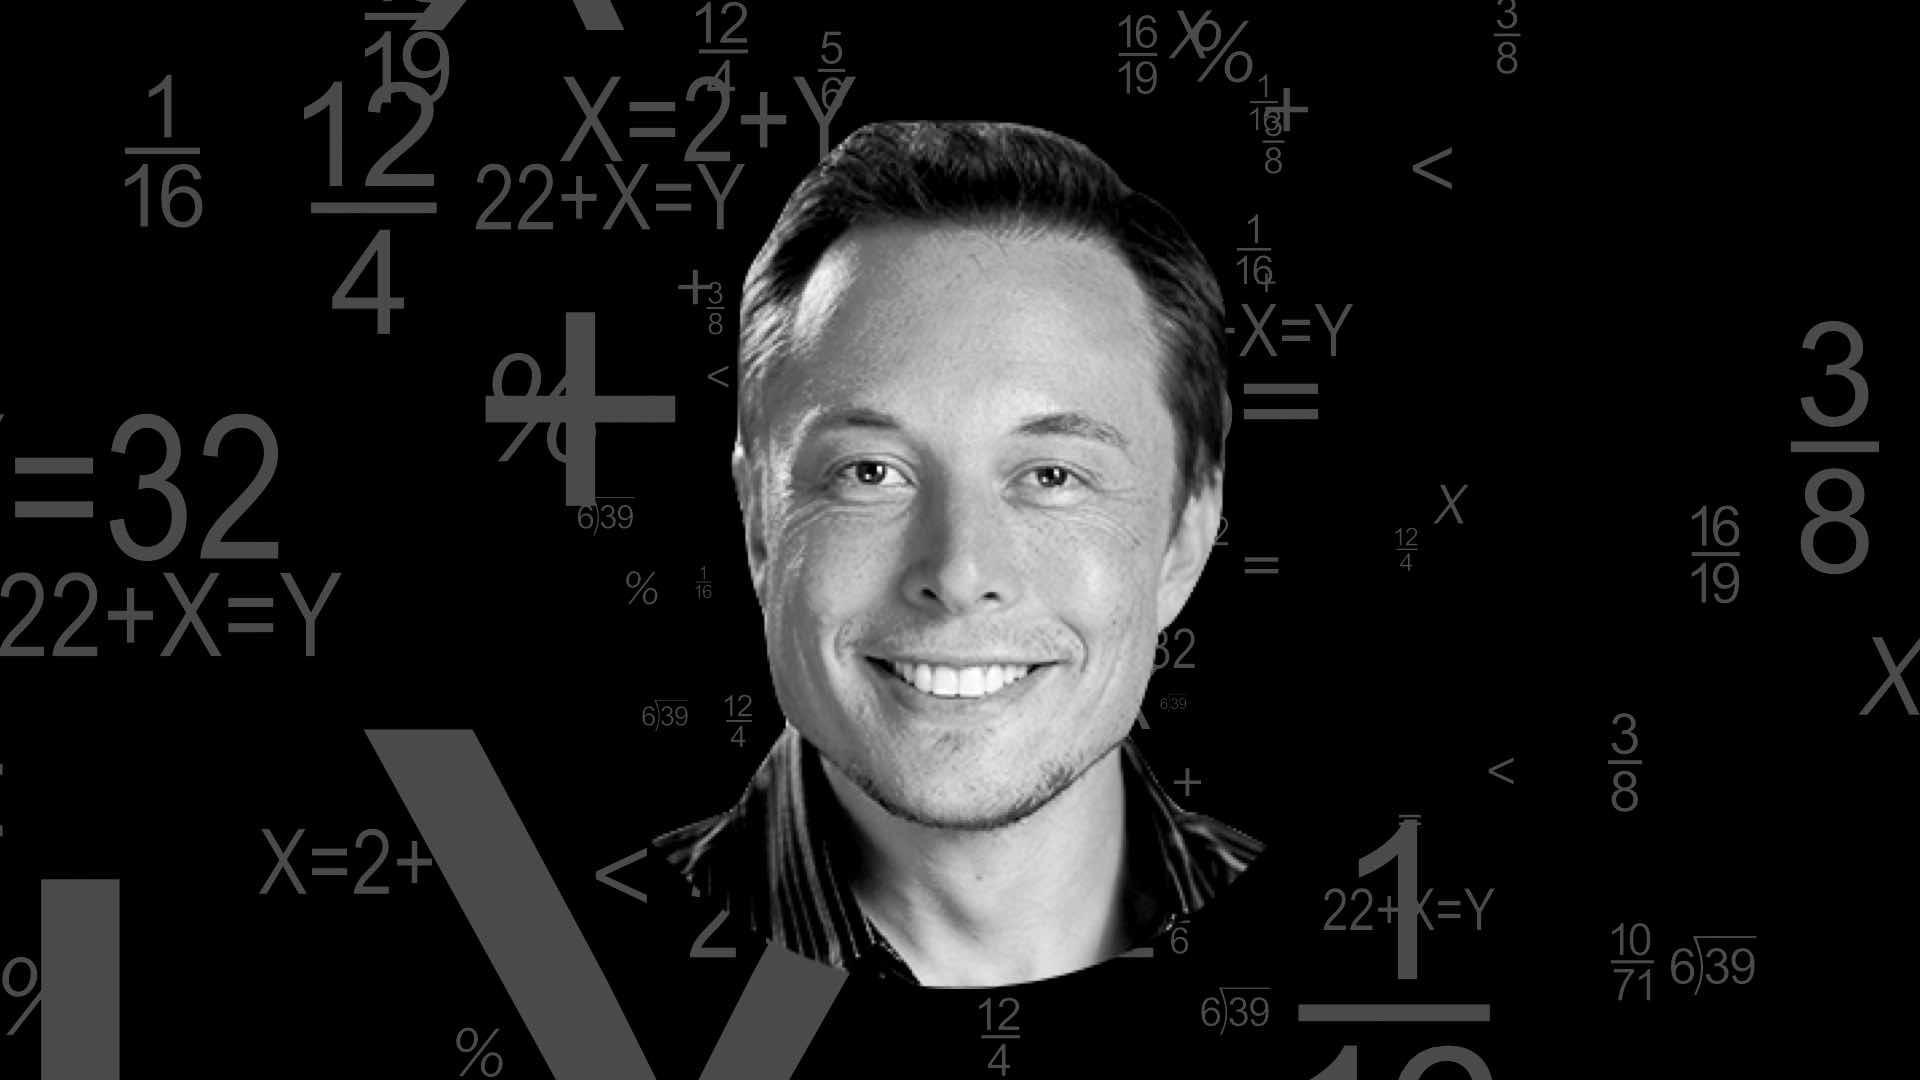 Iphone X The Verge Wallpaper Elon Musk Wallpaper 82 Images